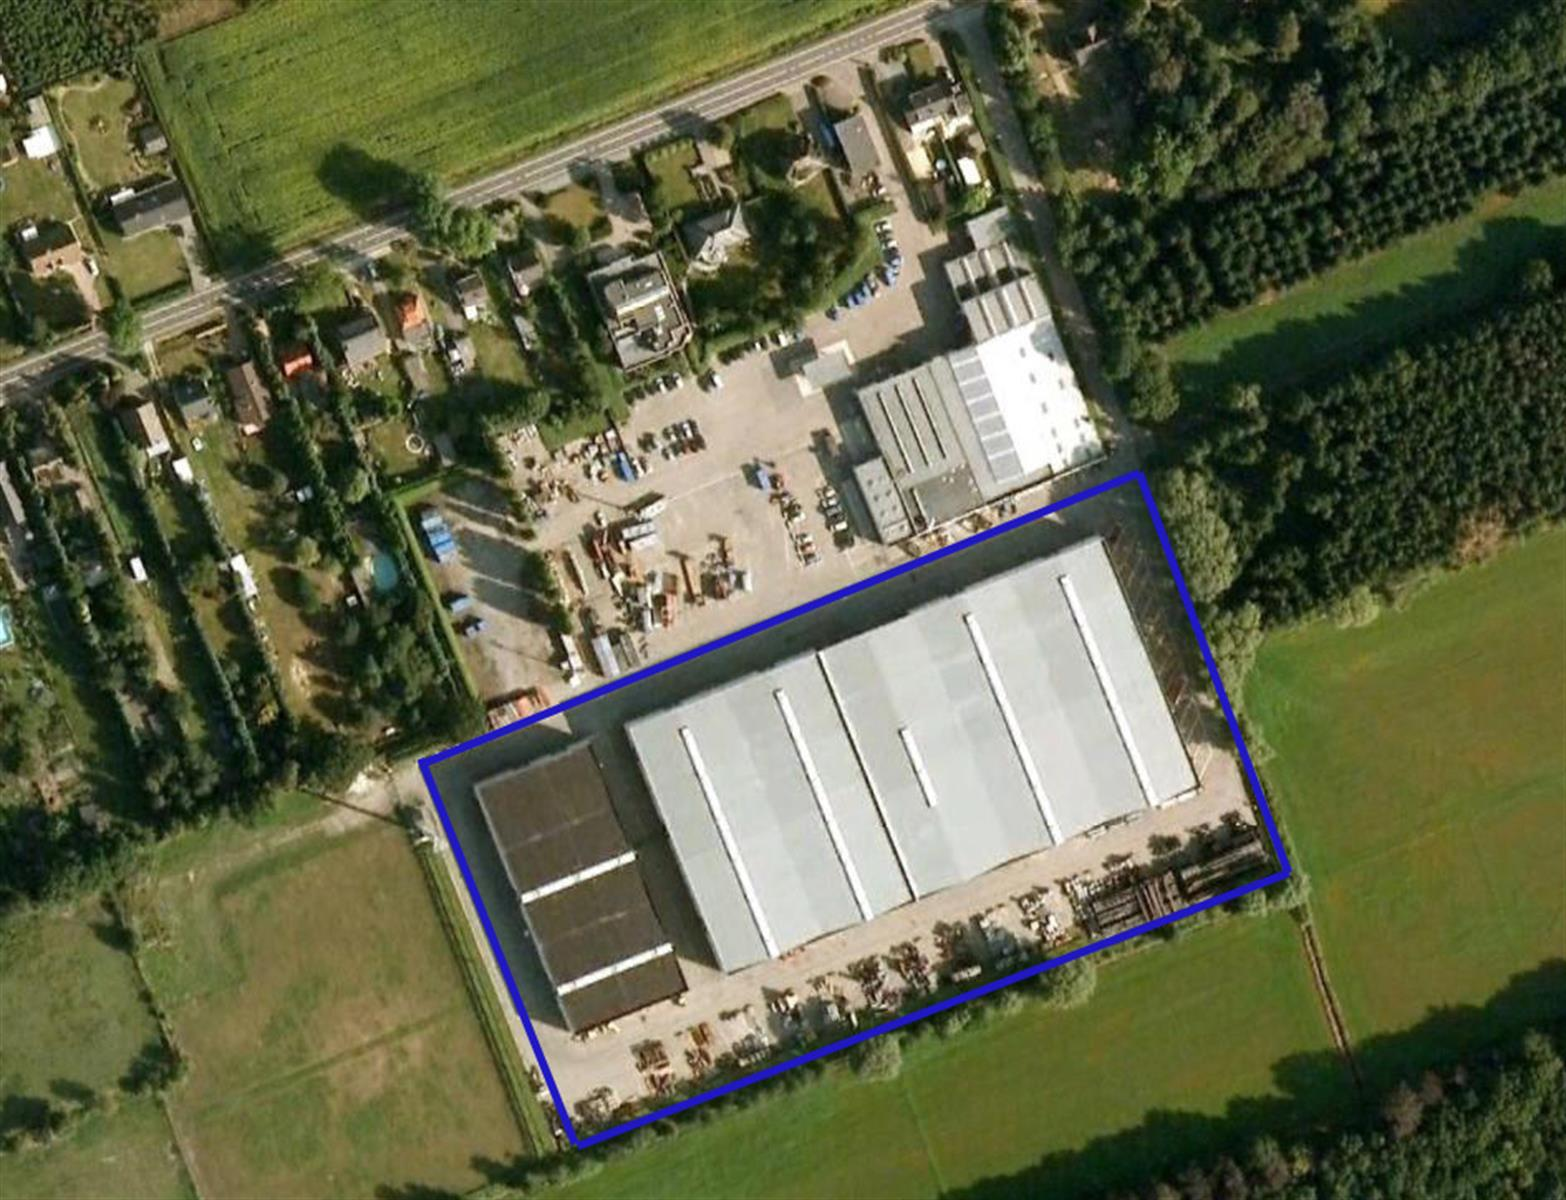 industrieel gebouw te huur KMO UNIT 1620m² MEERDERE LOADING DOCKS te KAPELLEN (B002) 1640m² - 2950 Kapellen, België 6